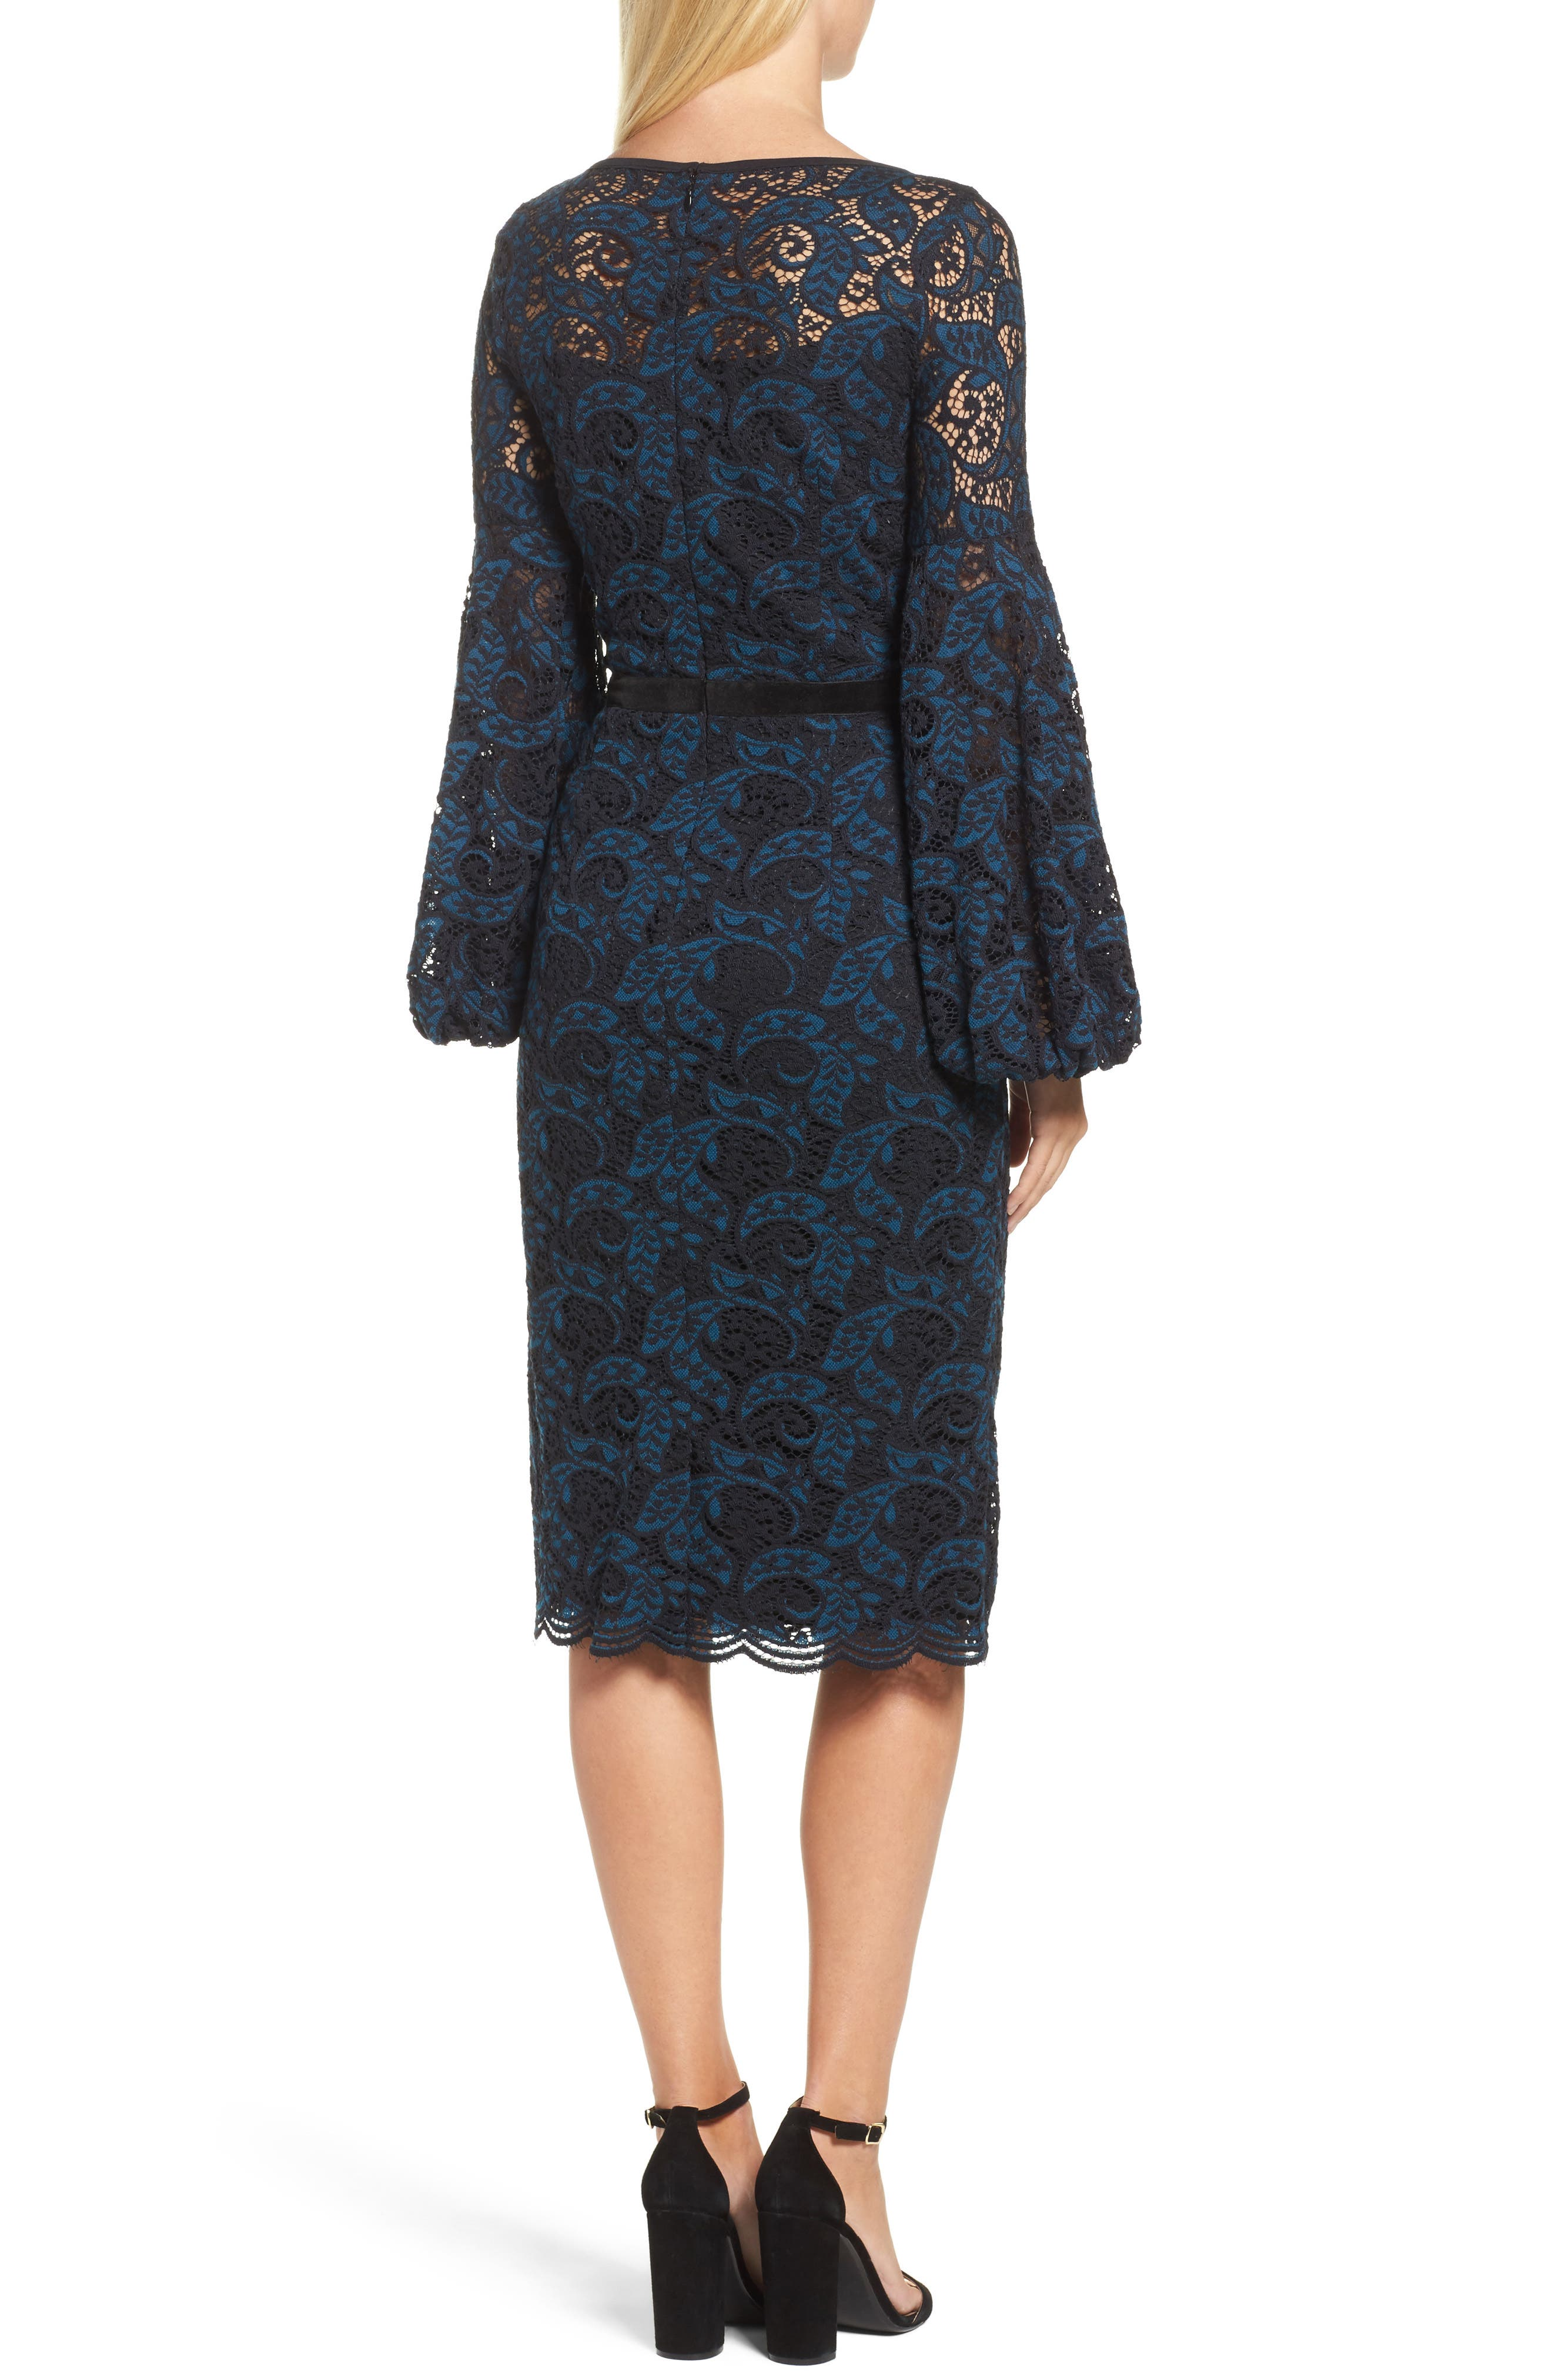 Lace Bishop Sleeve Dress,                             Alternate thumbnail 2, color,                             Blue/ Black